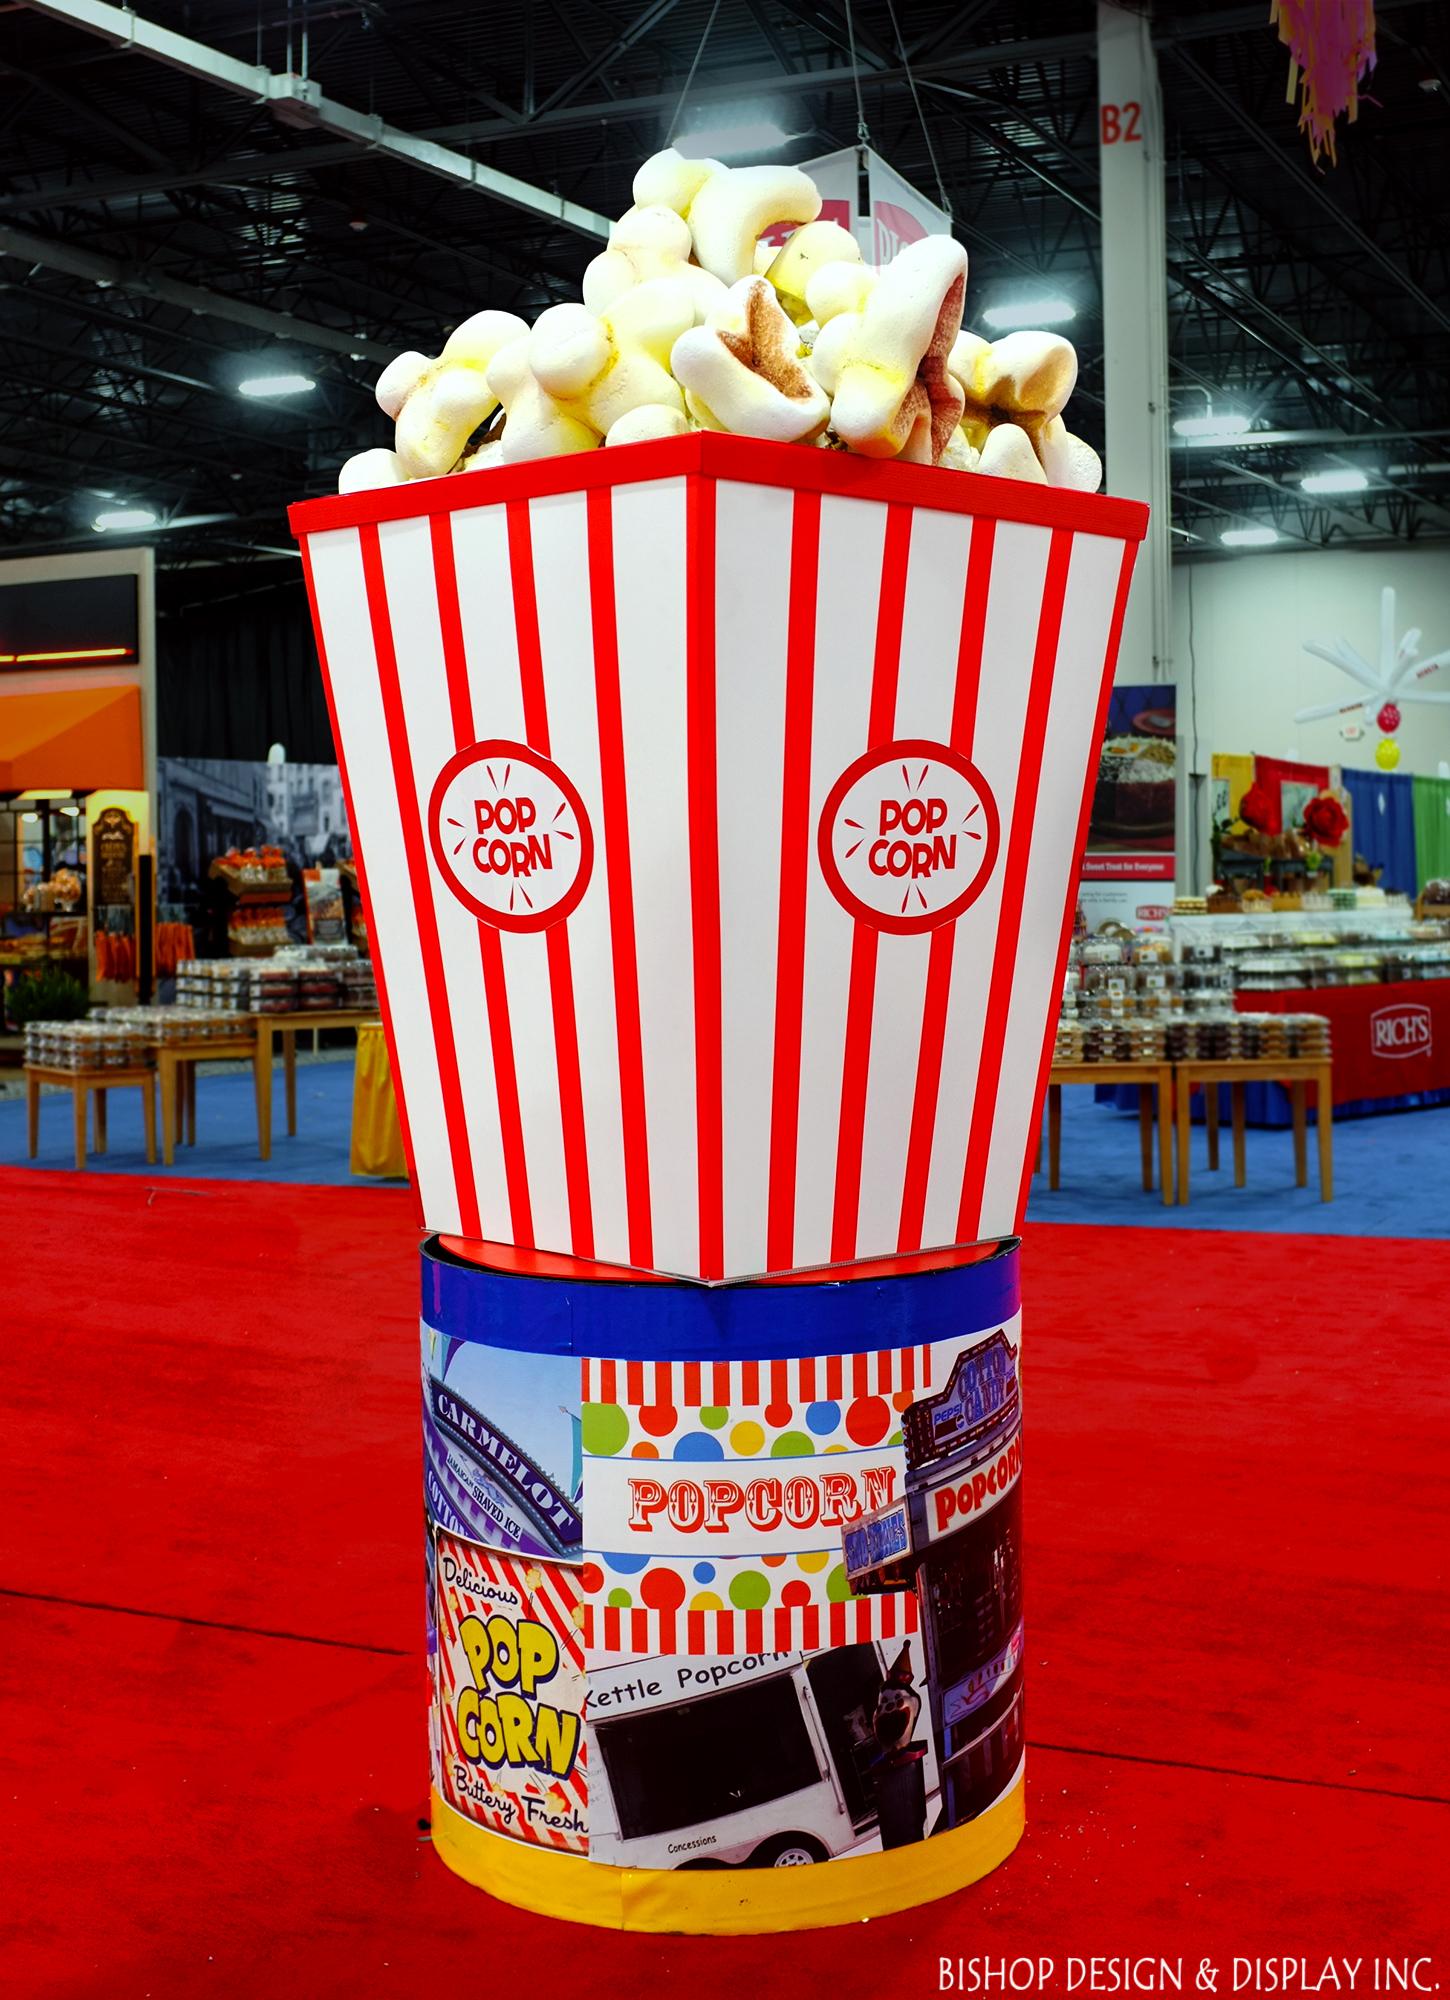 Popcorn & Bag